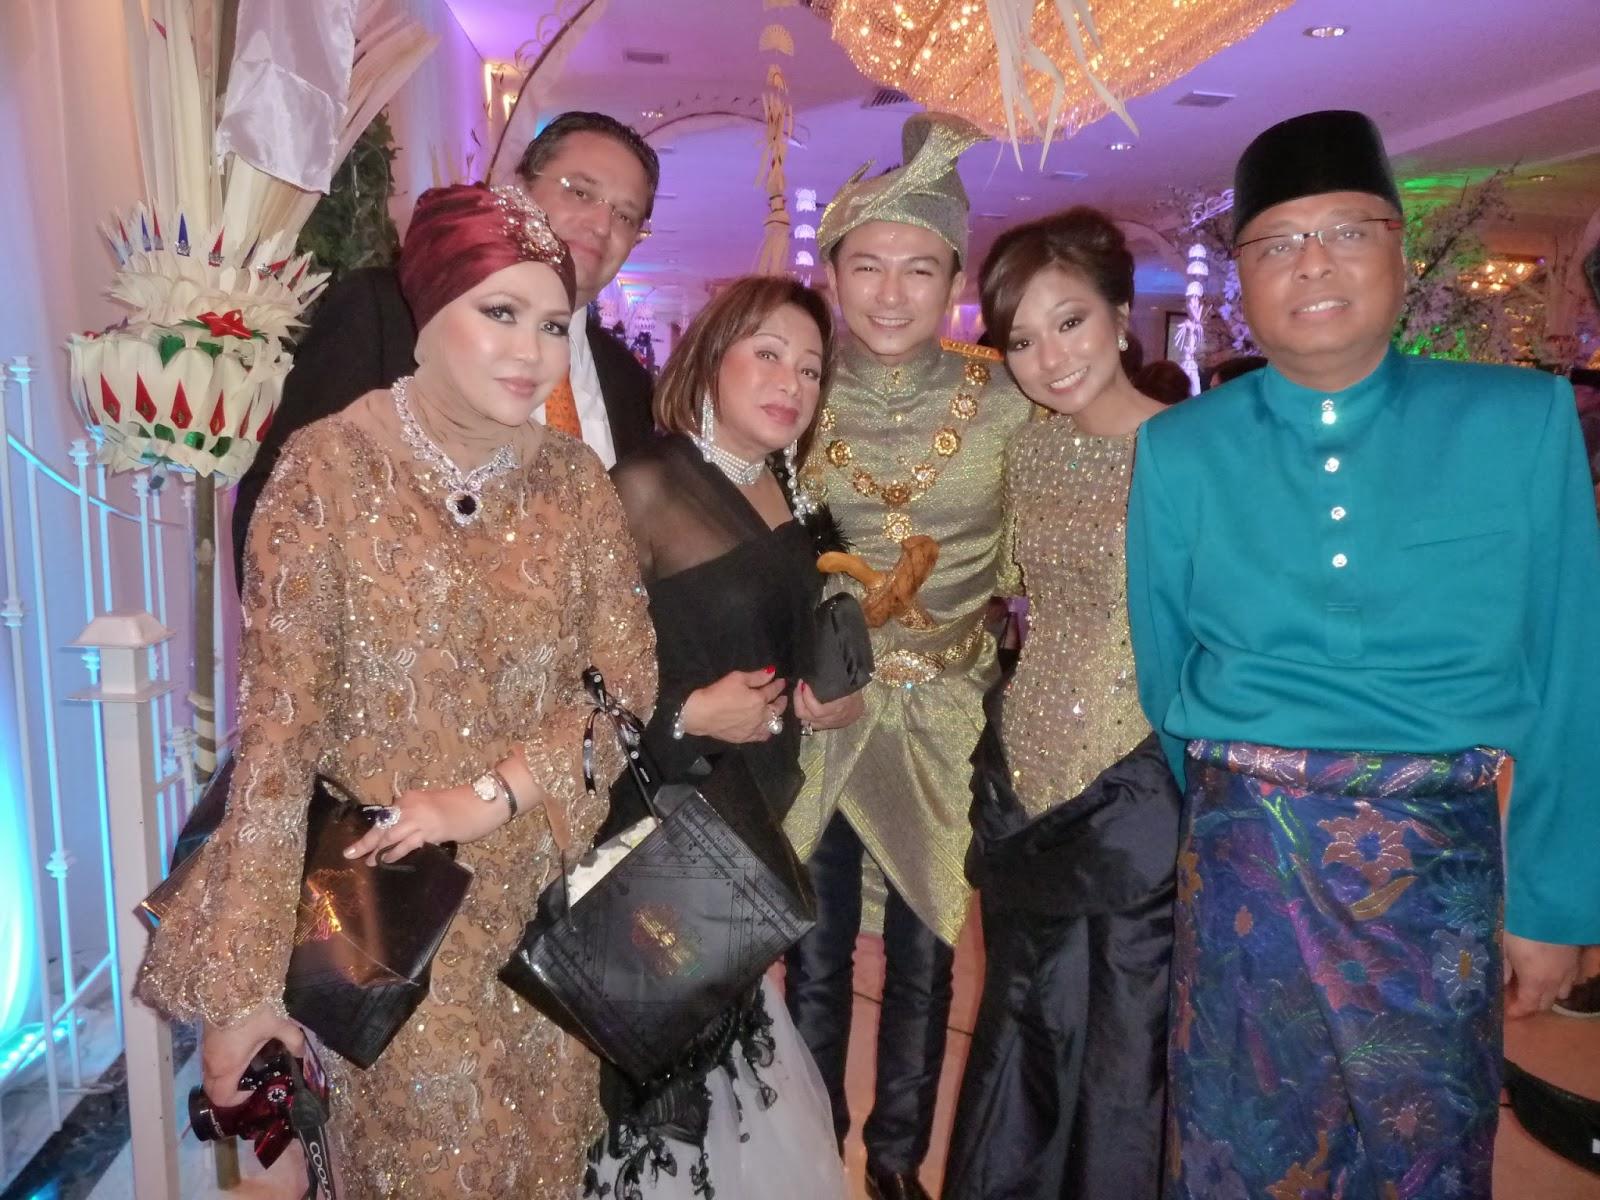 Kee Hua Chee Live Part 3 Jovian Mandagie S Wedding Of The Year To Nina Sabrina Datuk Sri Ismail Sabri Daughter Of The Minister Of Agriculture And Agro Baseed Industries Datuk Seri Ismail Sabri